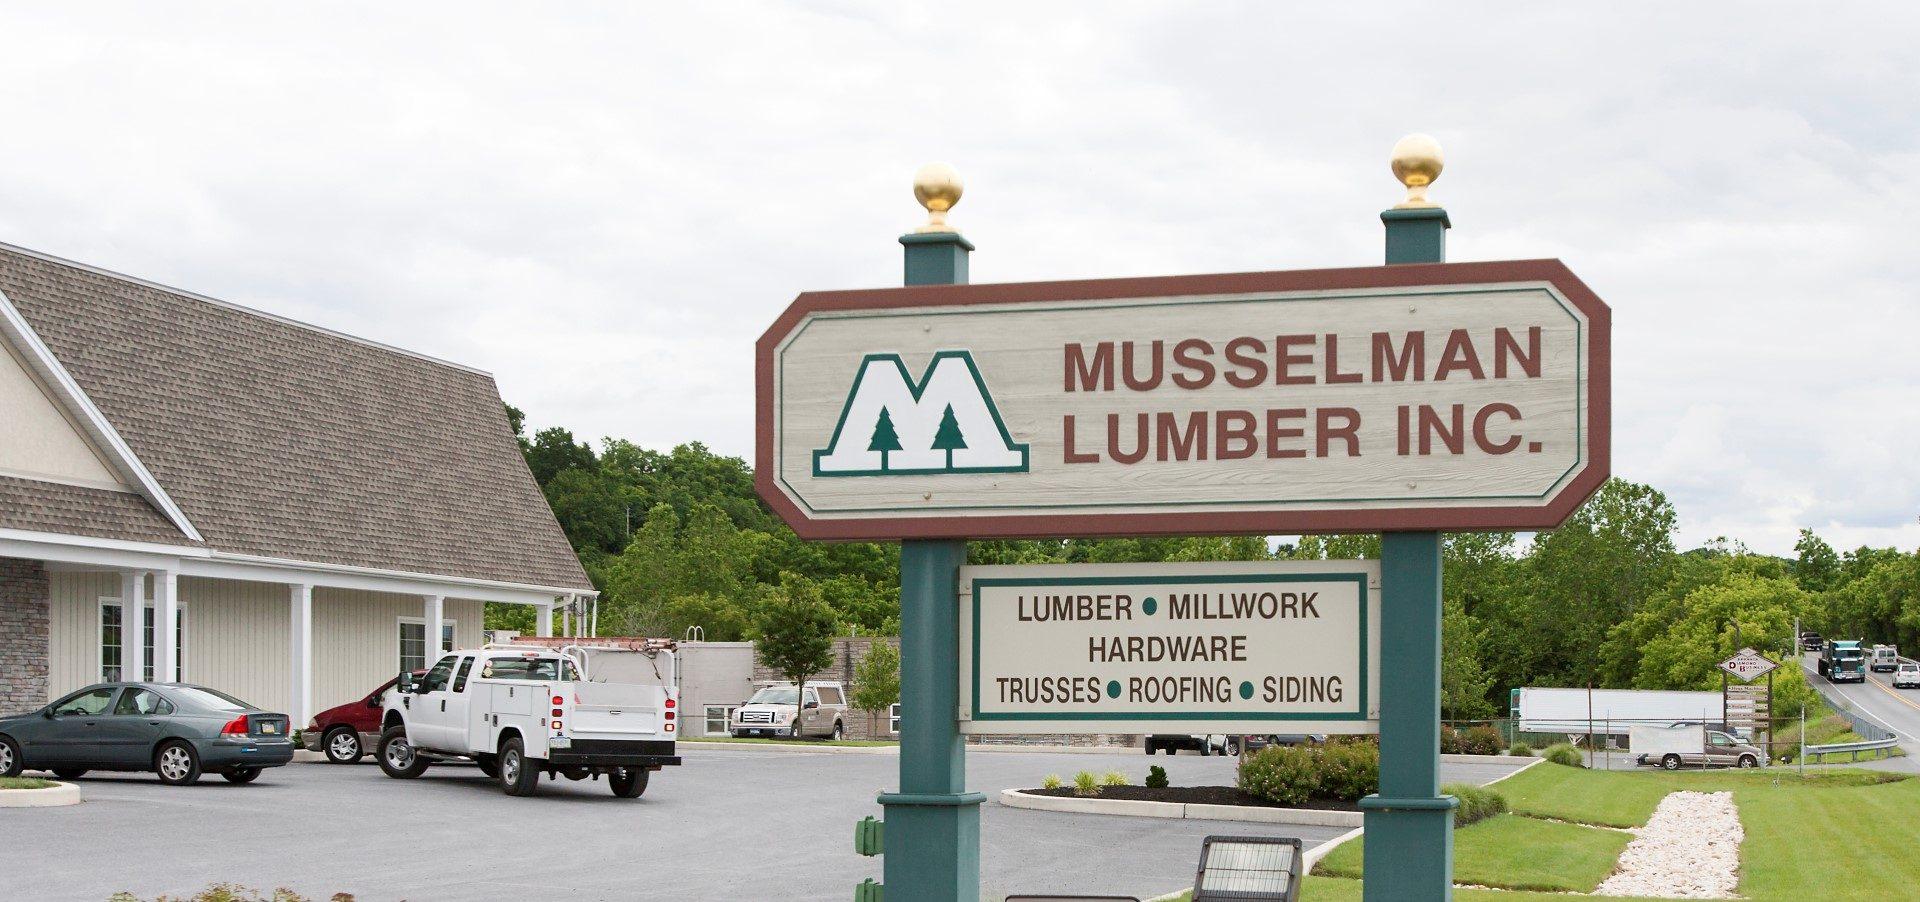 Musselman Lumber